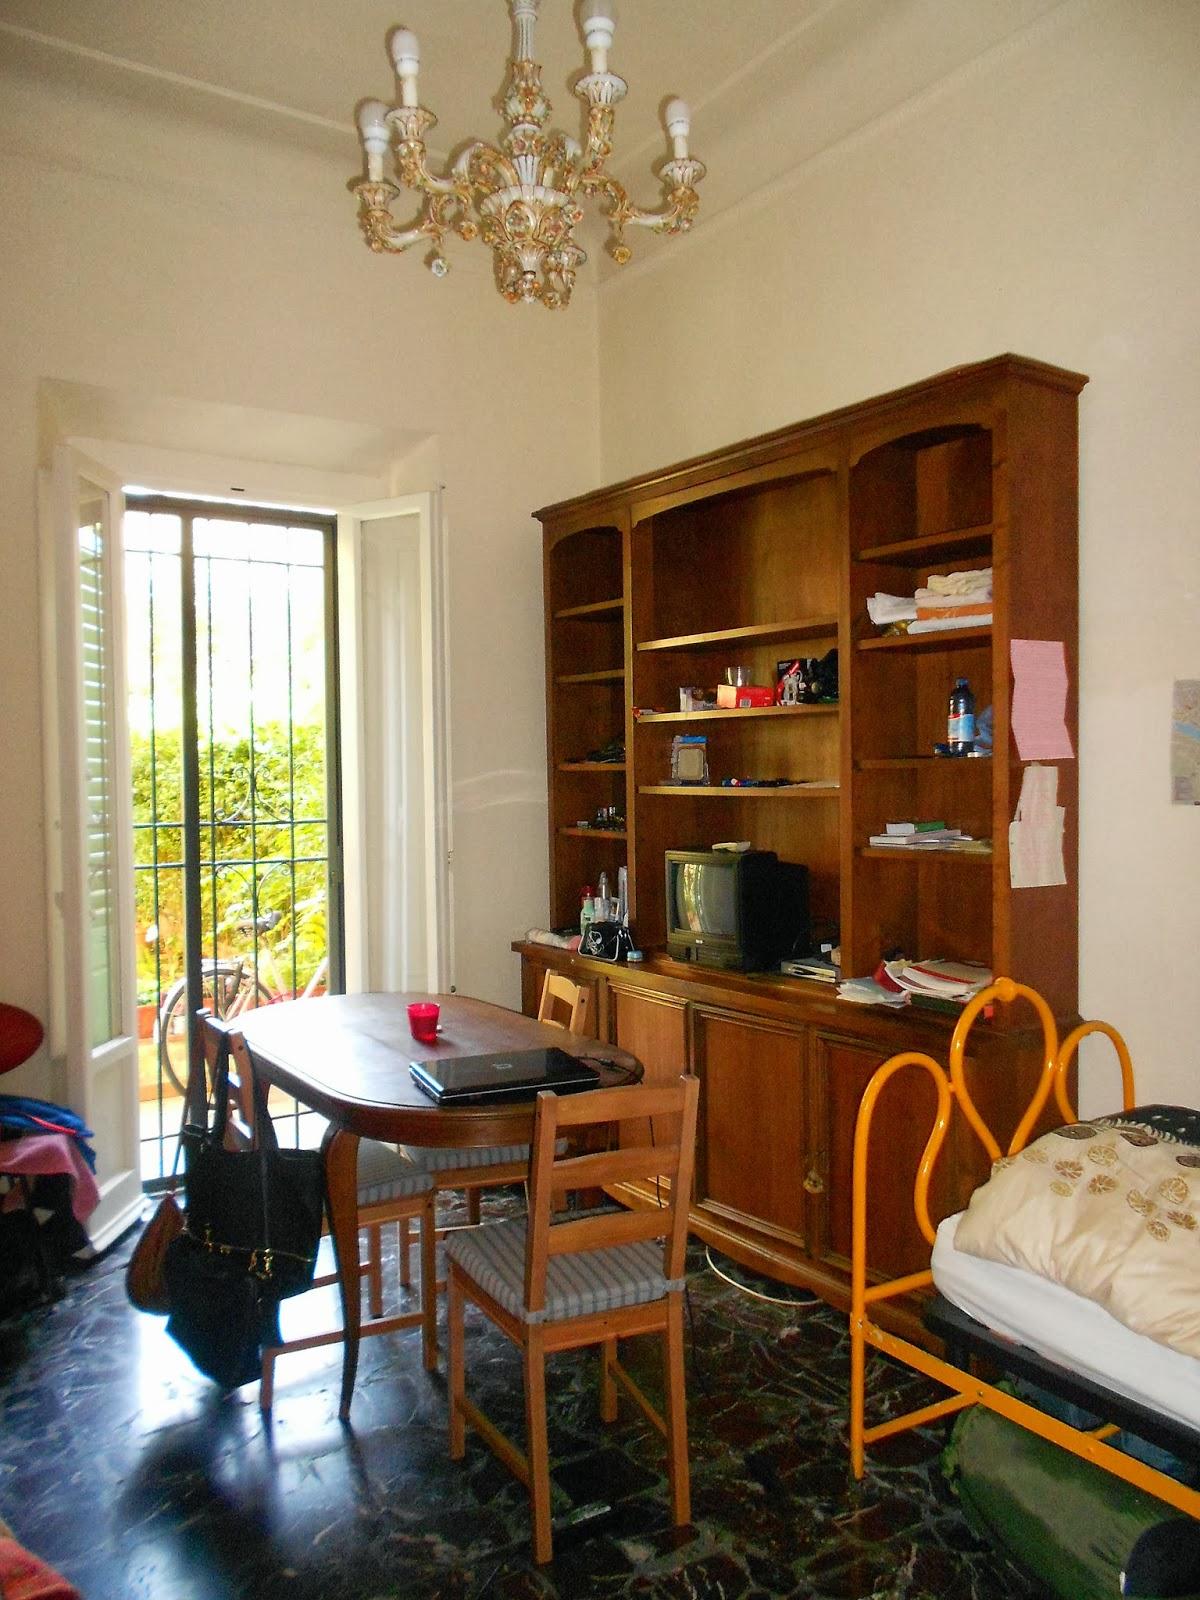 Studentenzimmer in florenz 3 raum wohnung via squarcialupi 3er wg provisionsfrei - Studentenzimmer hamburg ...